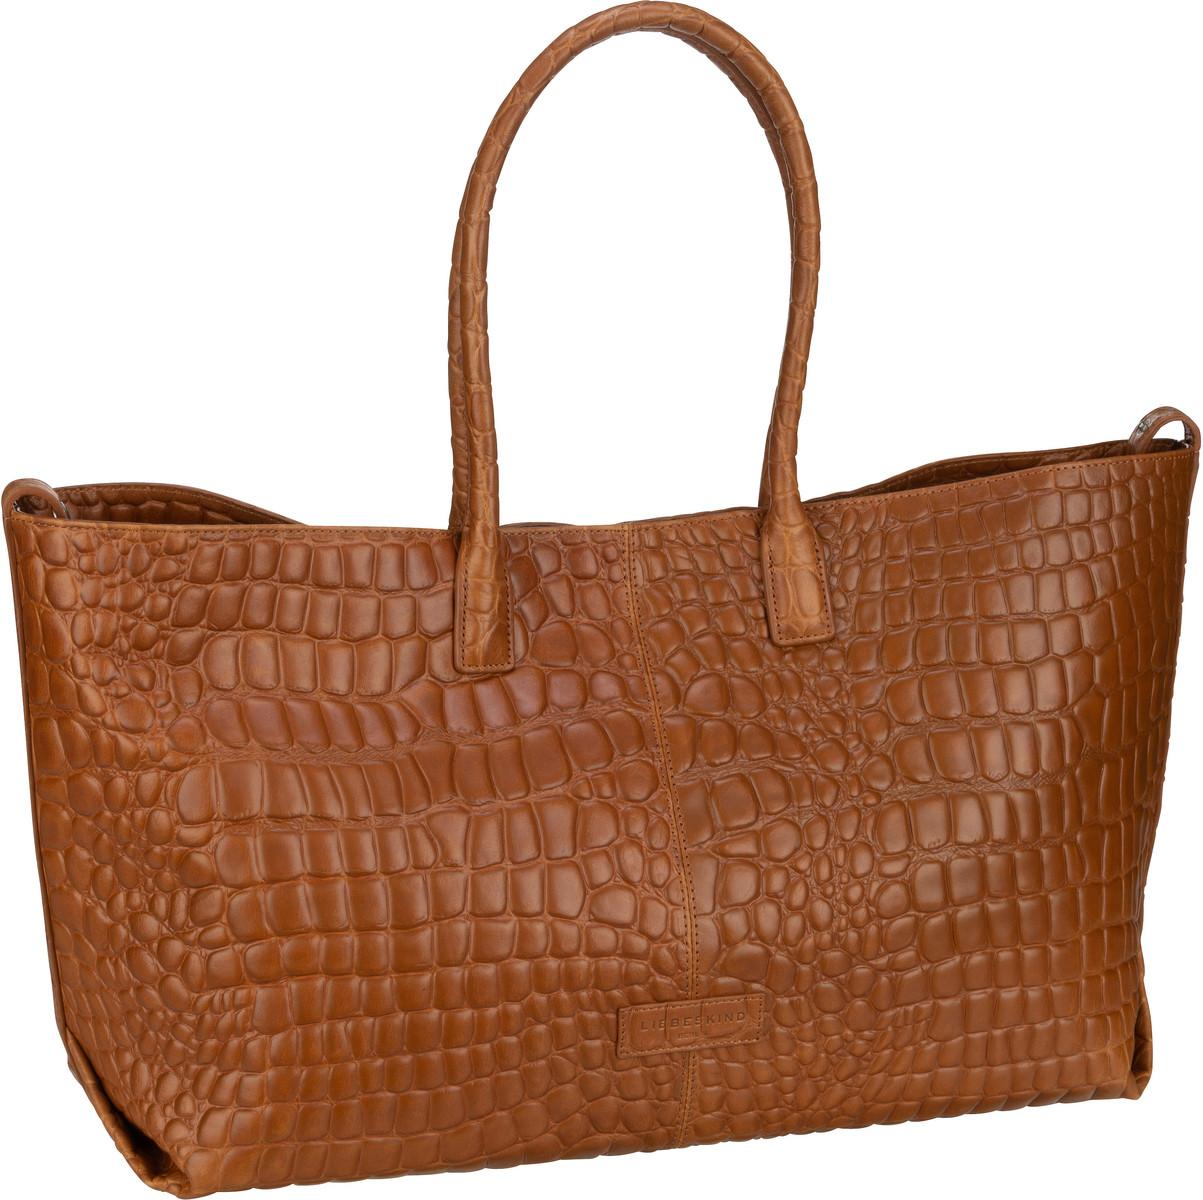 Berlin Handtasche Malibu 2 Chelsea Shopper L Croco Golden Amber